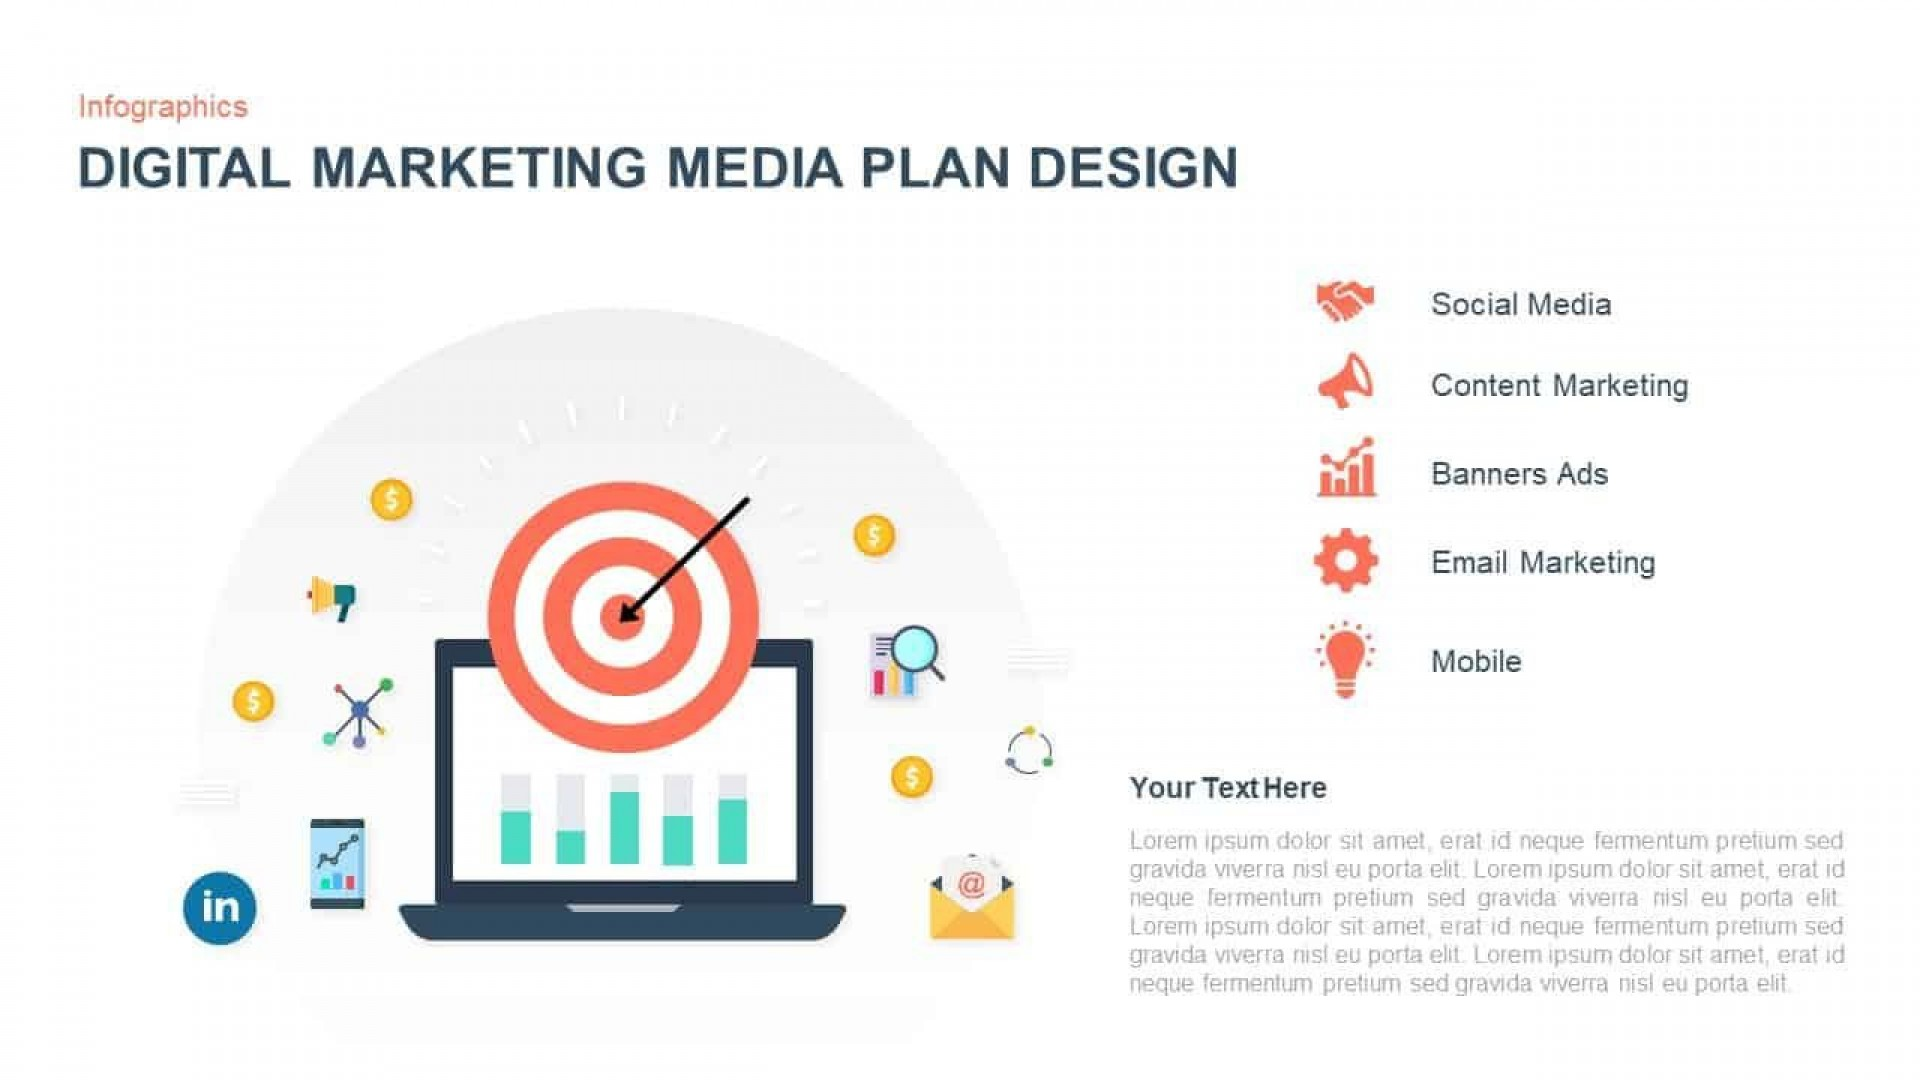 006 Imposing Digital Marketing Plan Template 2019 Example 1920